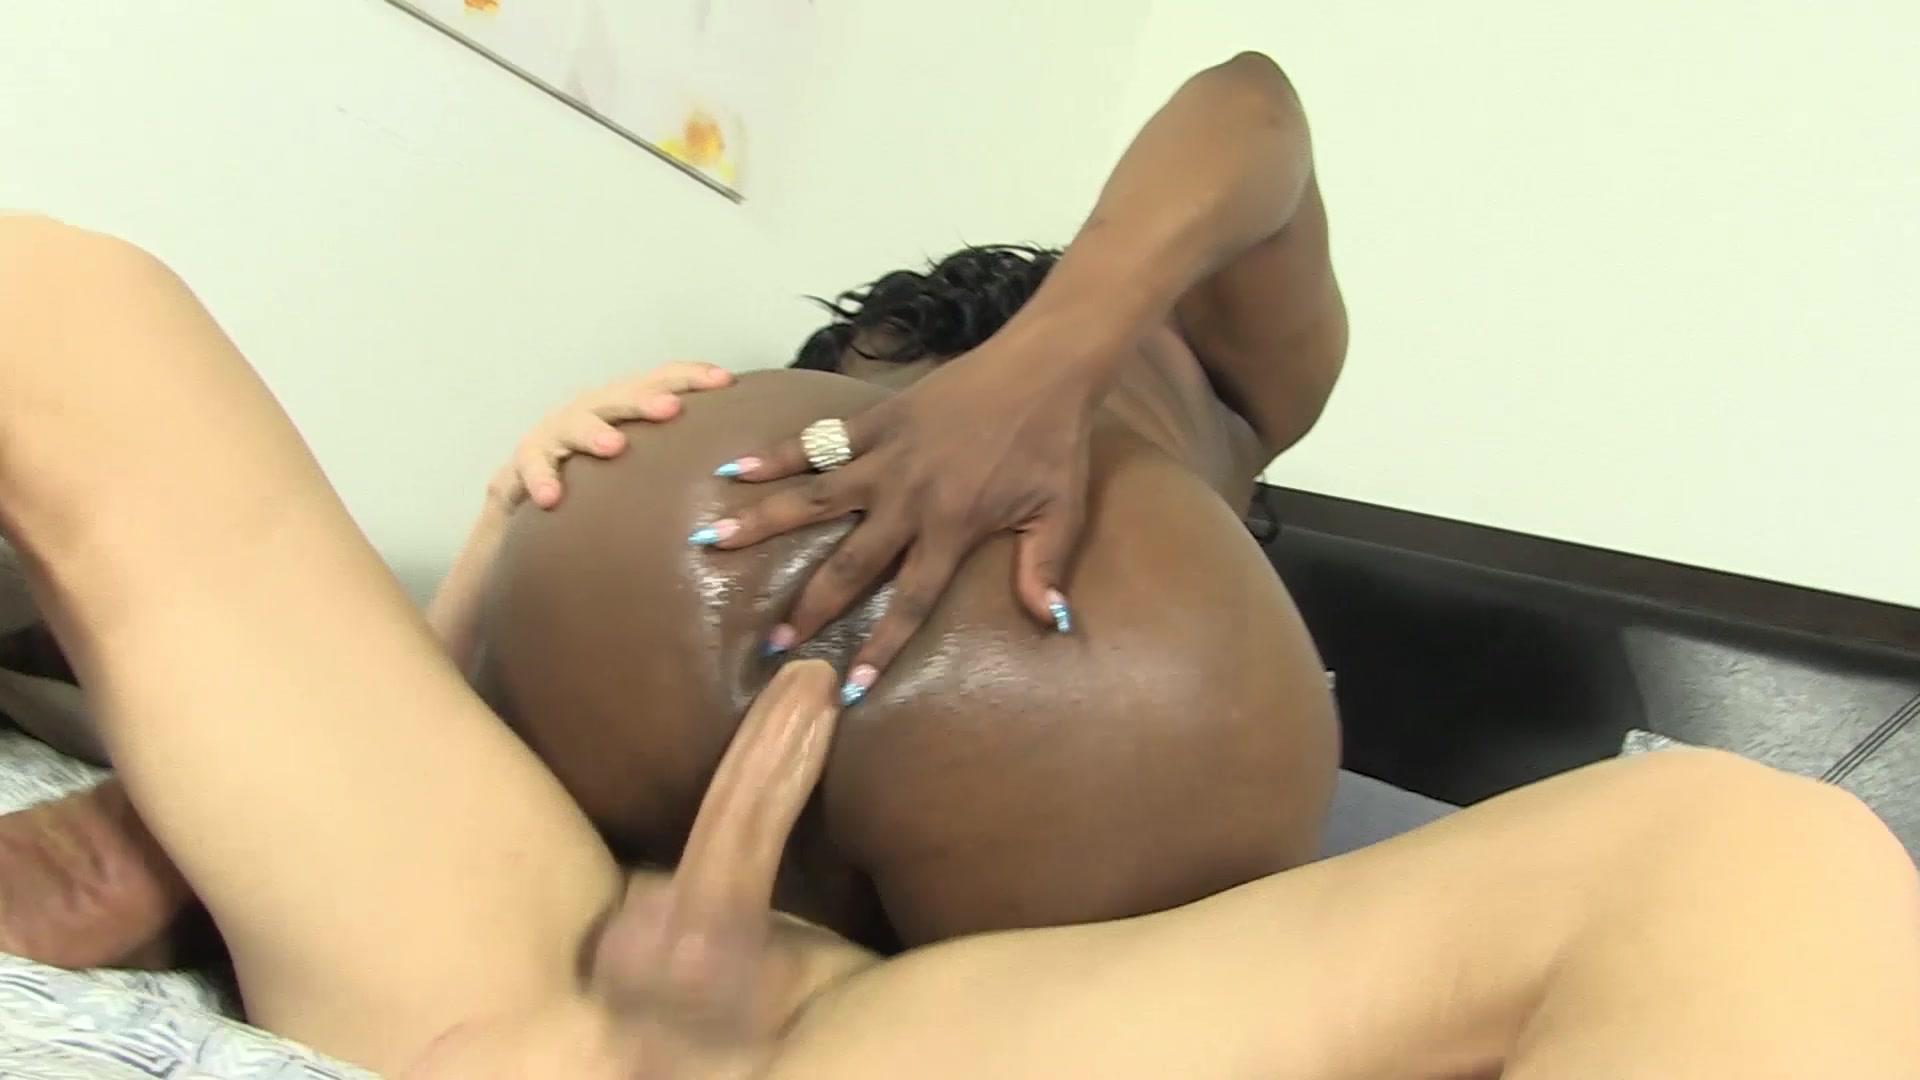 Xxx strapon pics, free dildo porn galery, sexy strapon clips